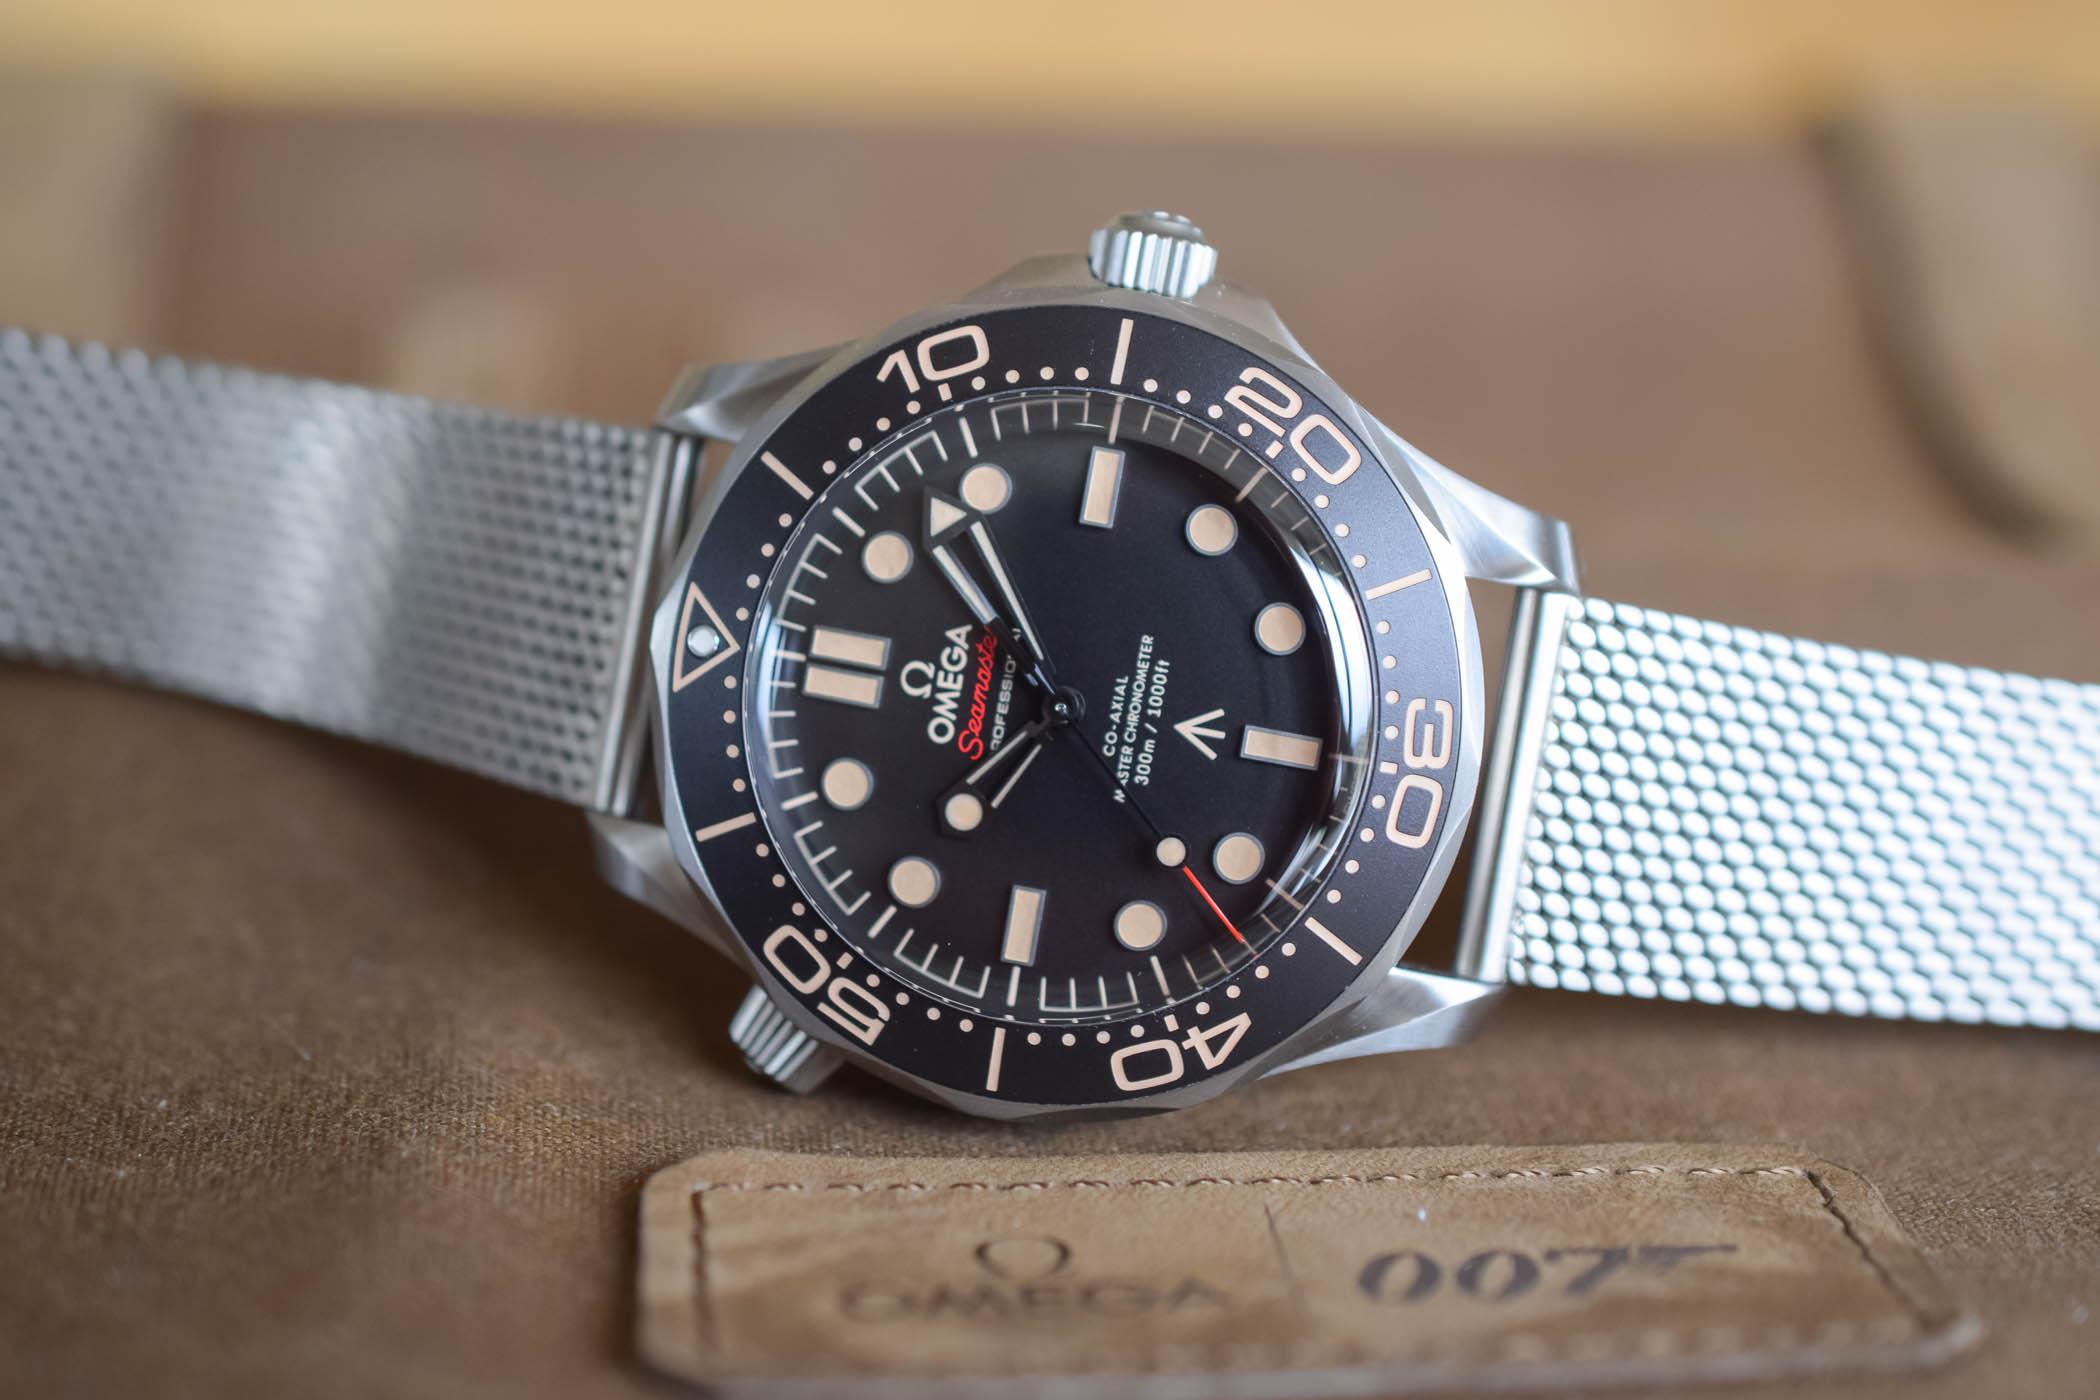 Omega Seamaster Diver 300M 007 Edition 210.90.42.20.01.001